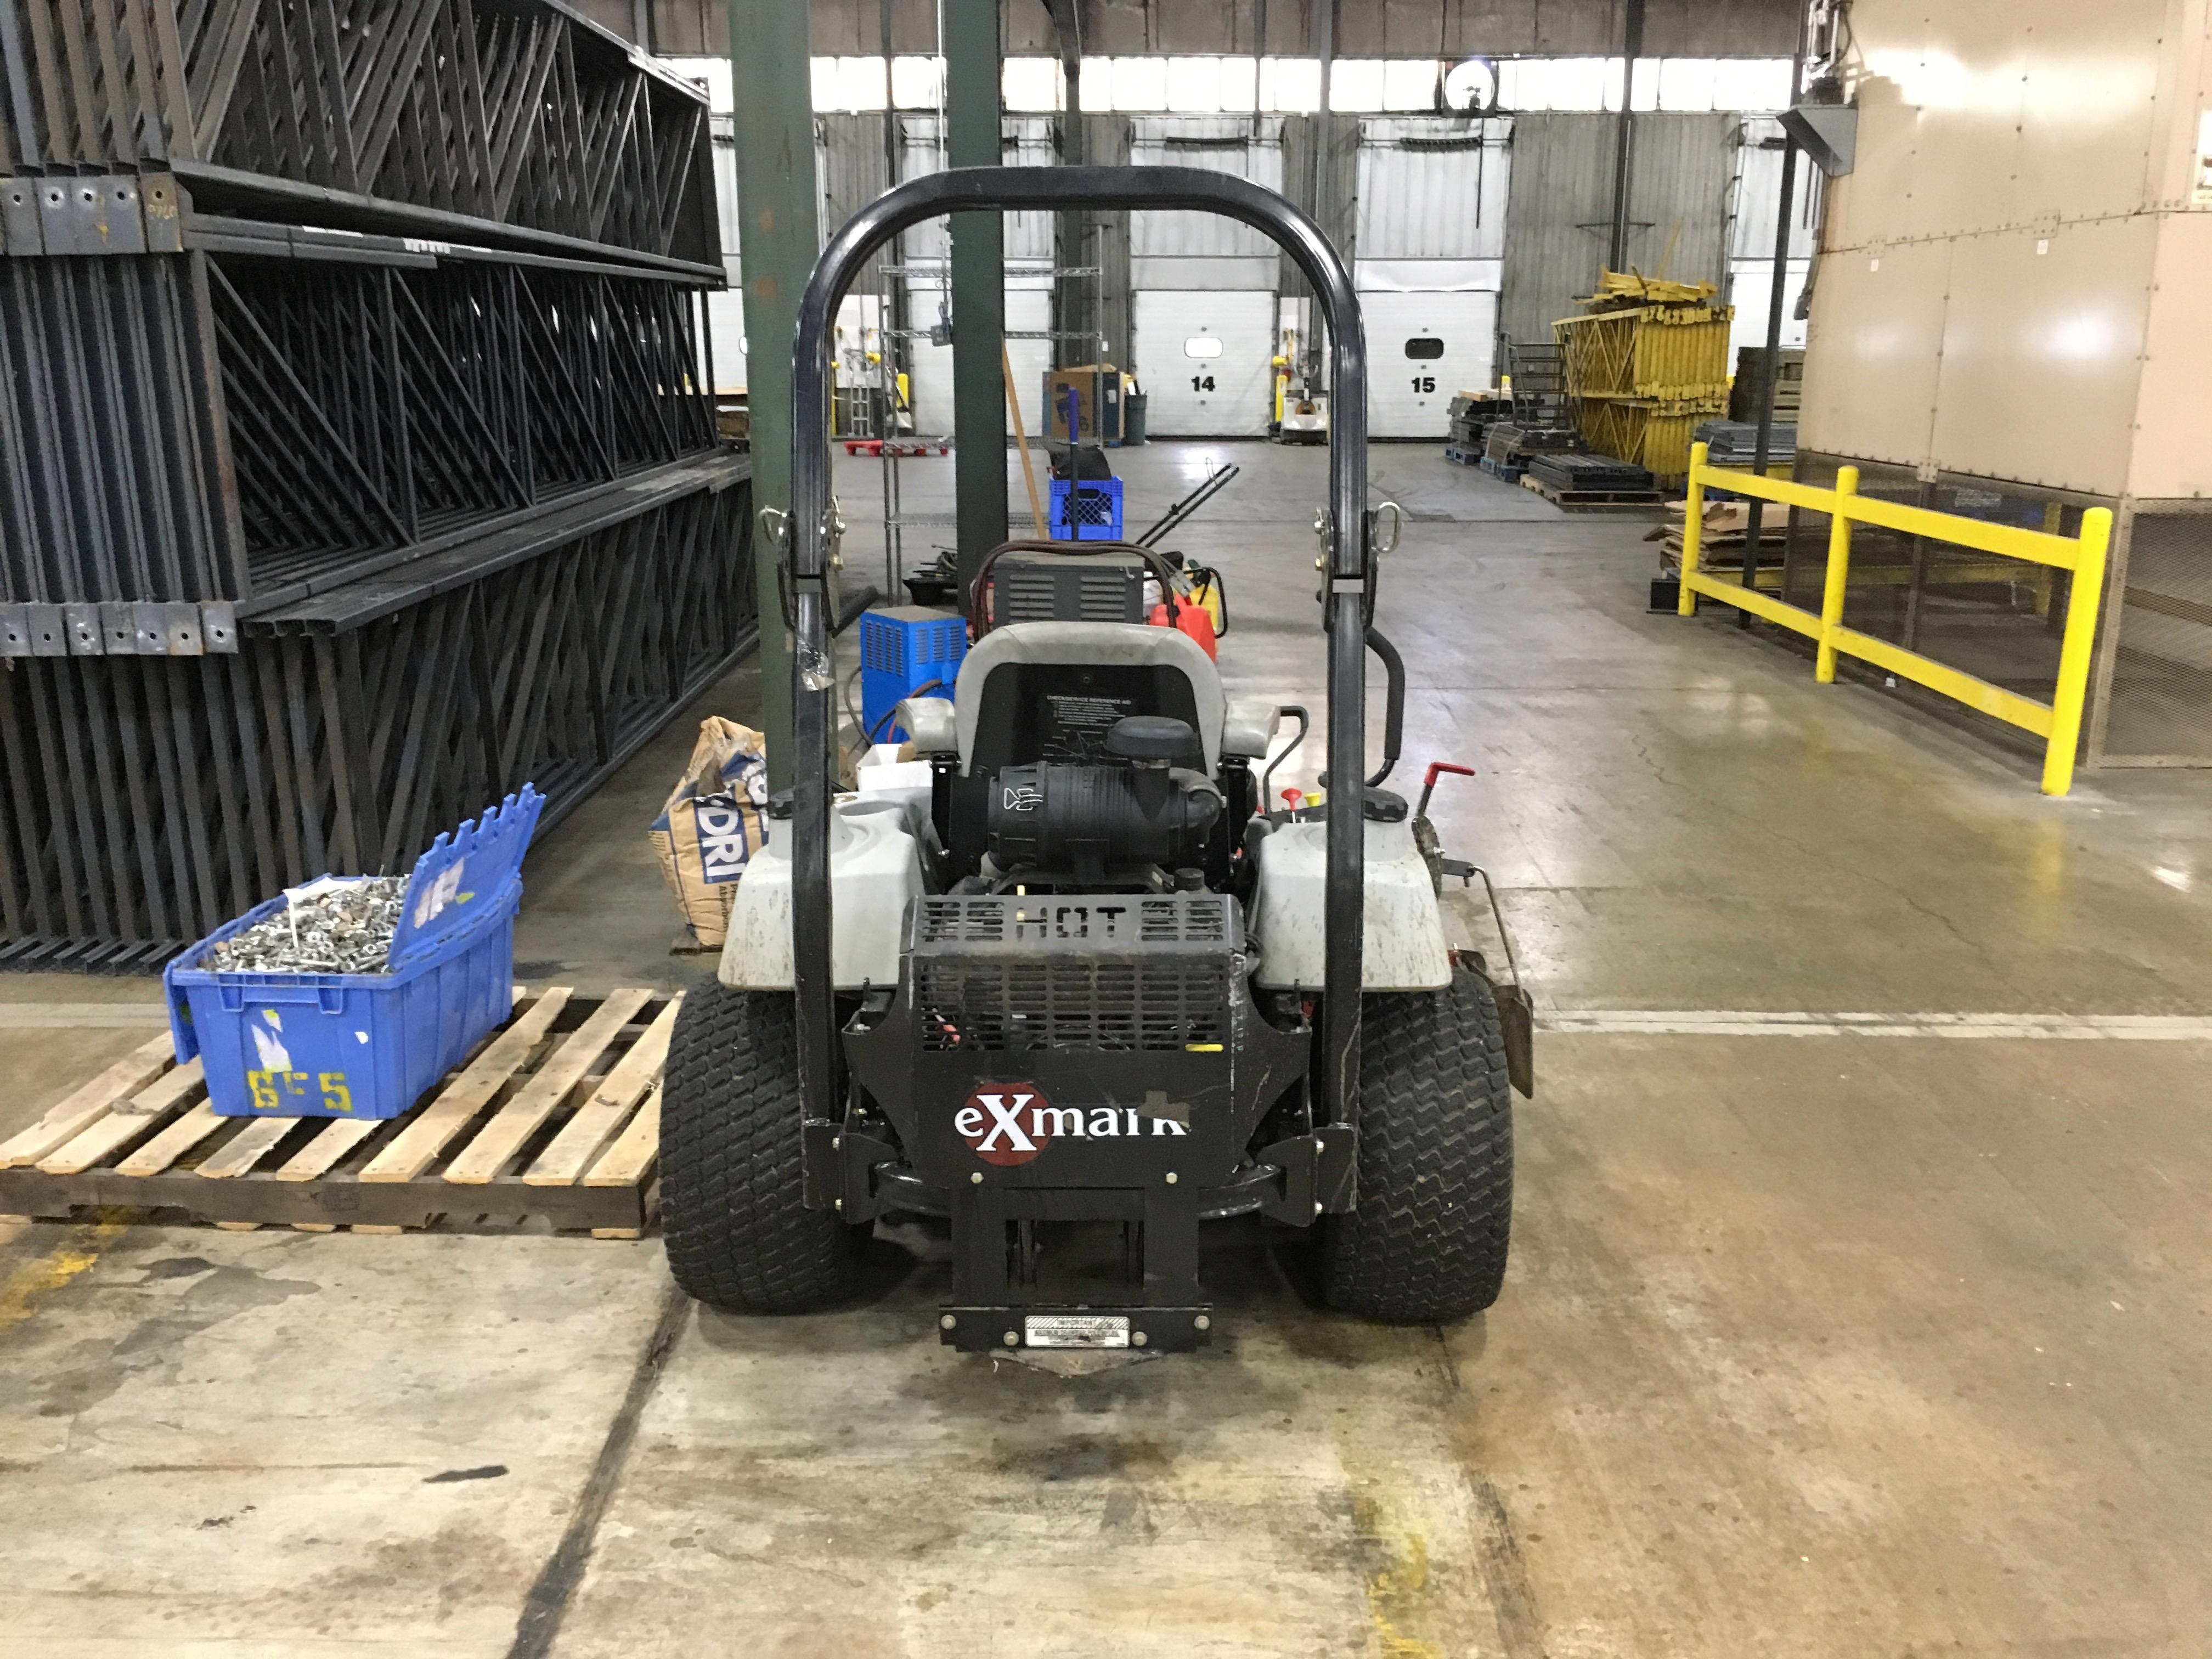 Exmark Lazer 60 U0026 39  U0026 39  Zero Turn Commercial Lawn Mower  Ultra Cut 60  Kohler 27